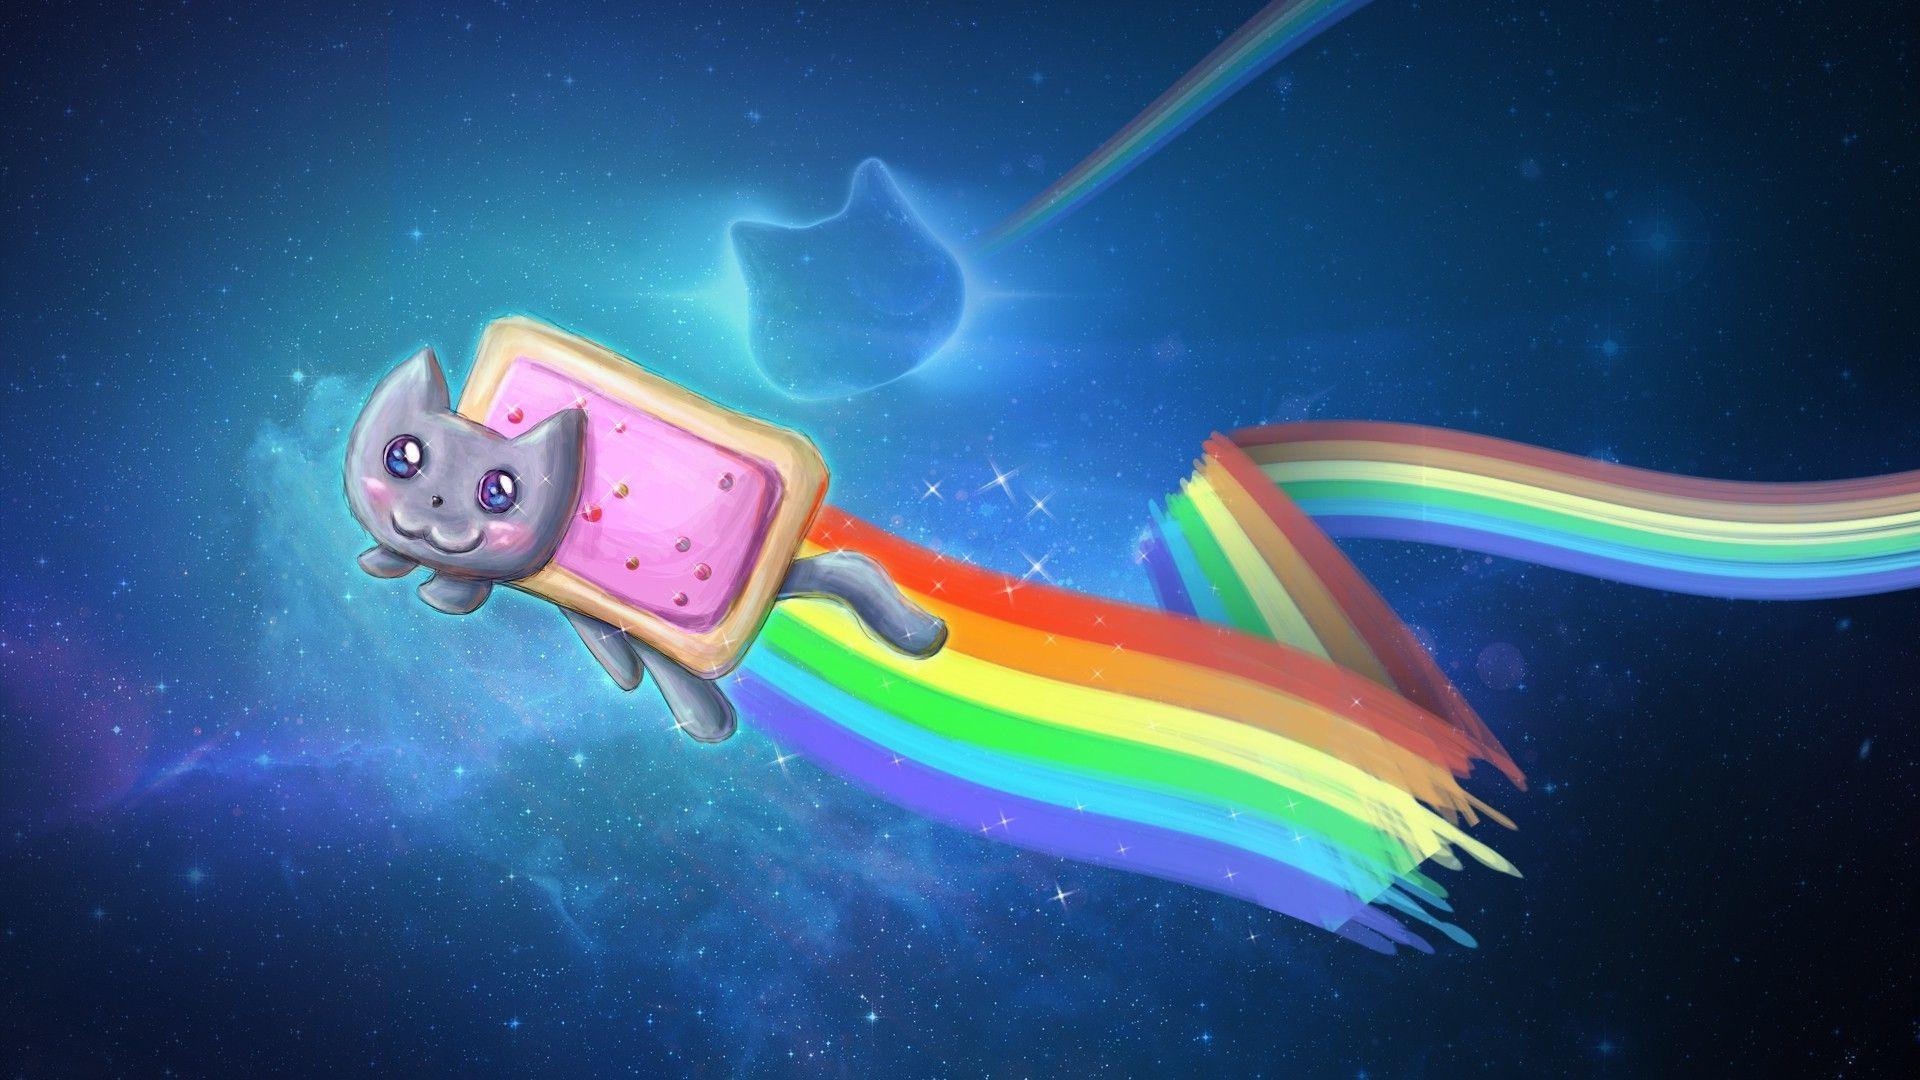 Nyan Cat HD wallpapers, Desktop wallpaper - most viewed